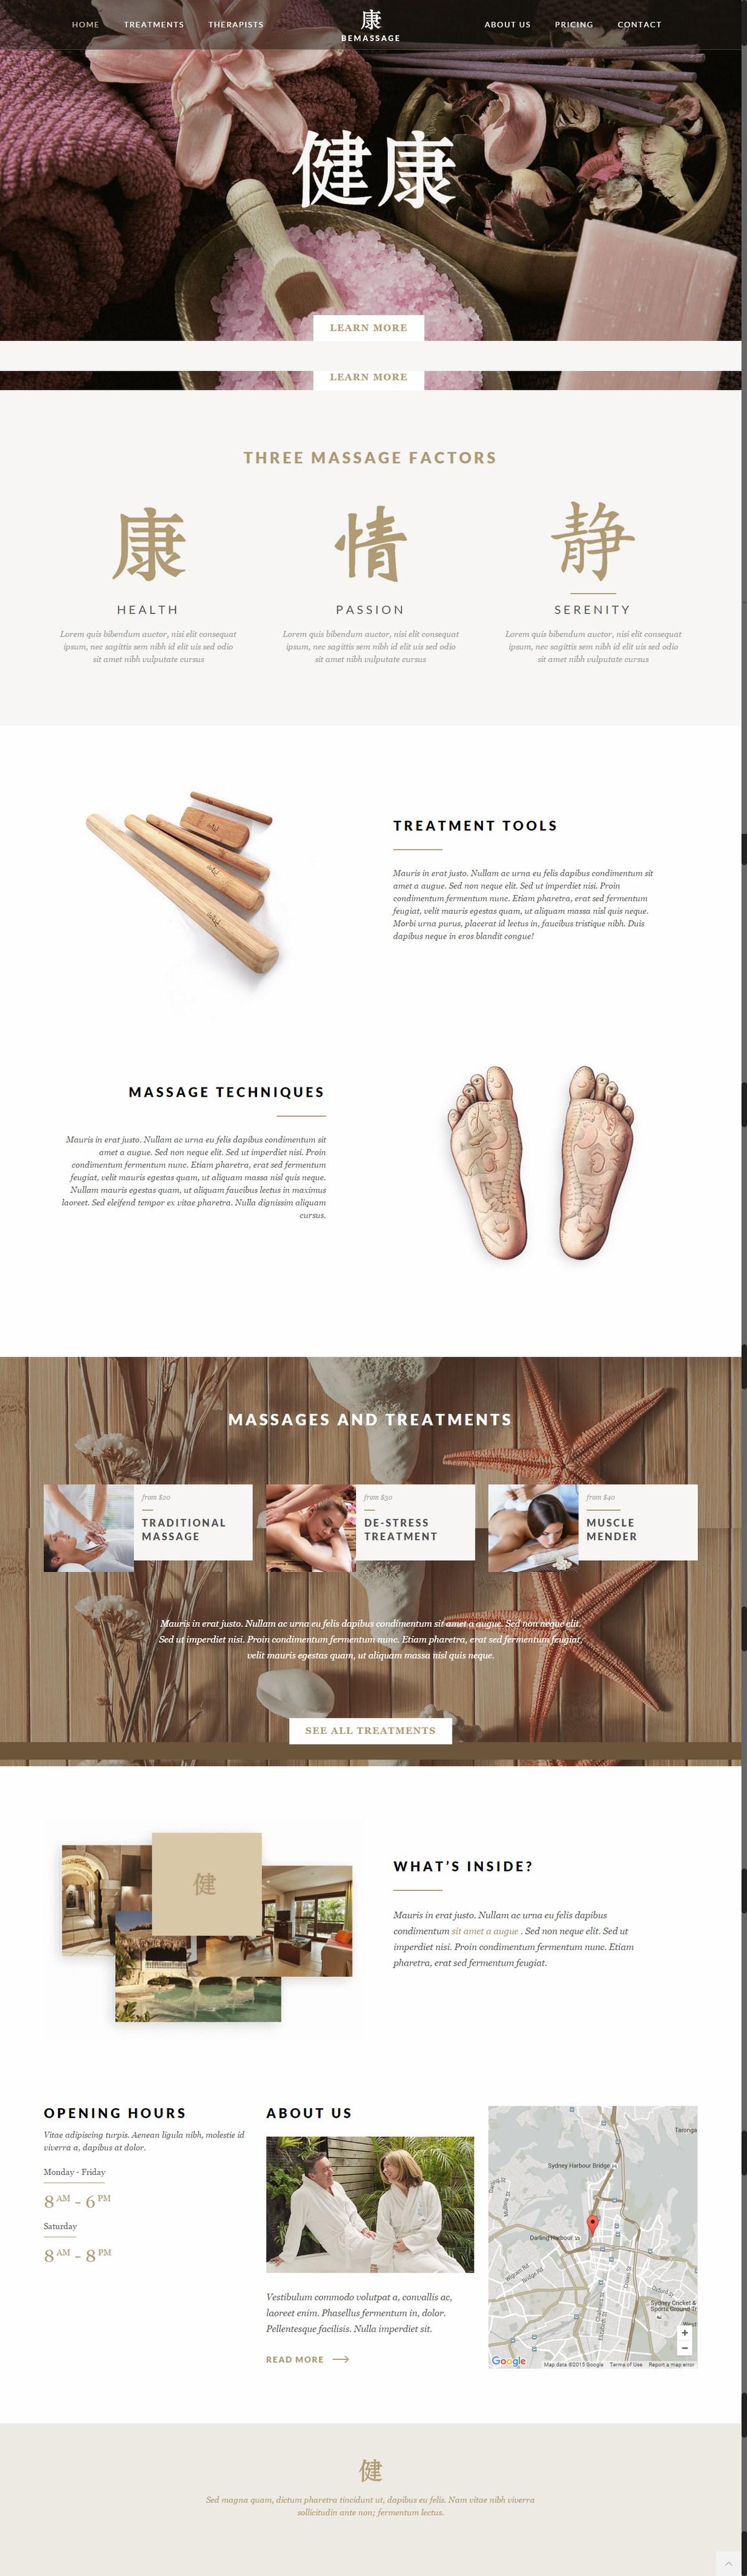 betheme-massage-home